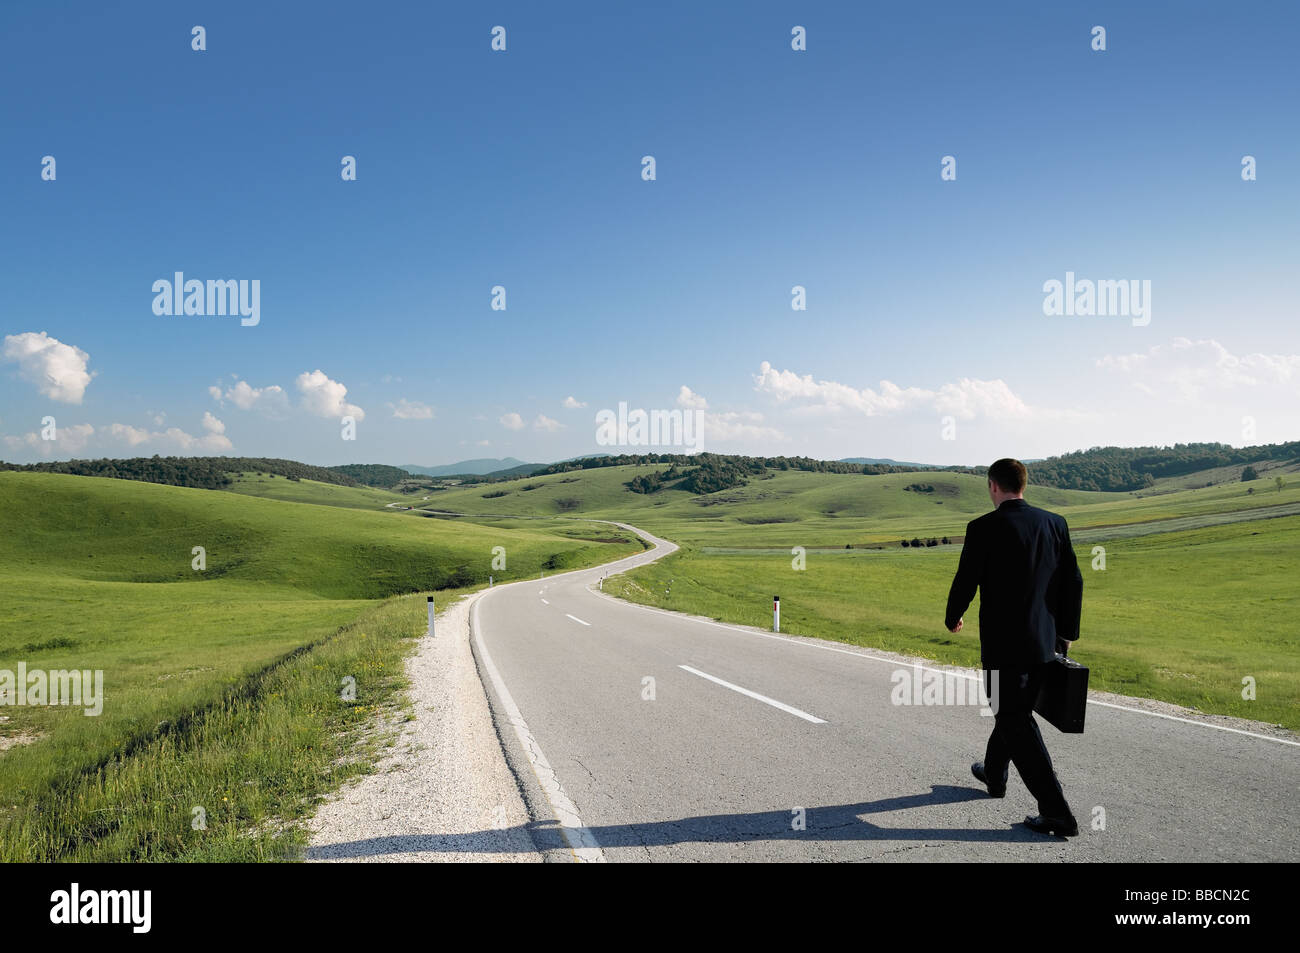 Geschäftsmann zu Fuß entlang einer abgelegenen Landstraße Rückansicht Stockbild